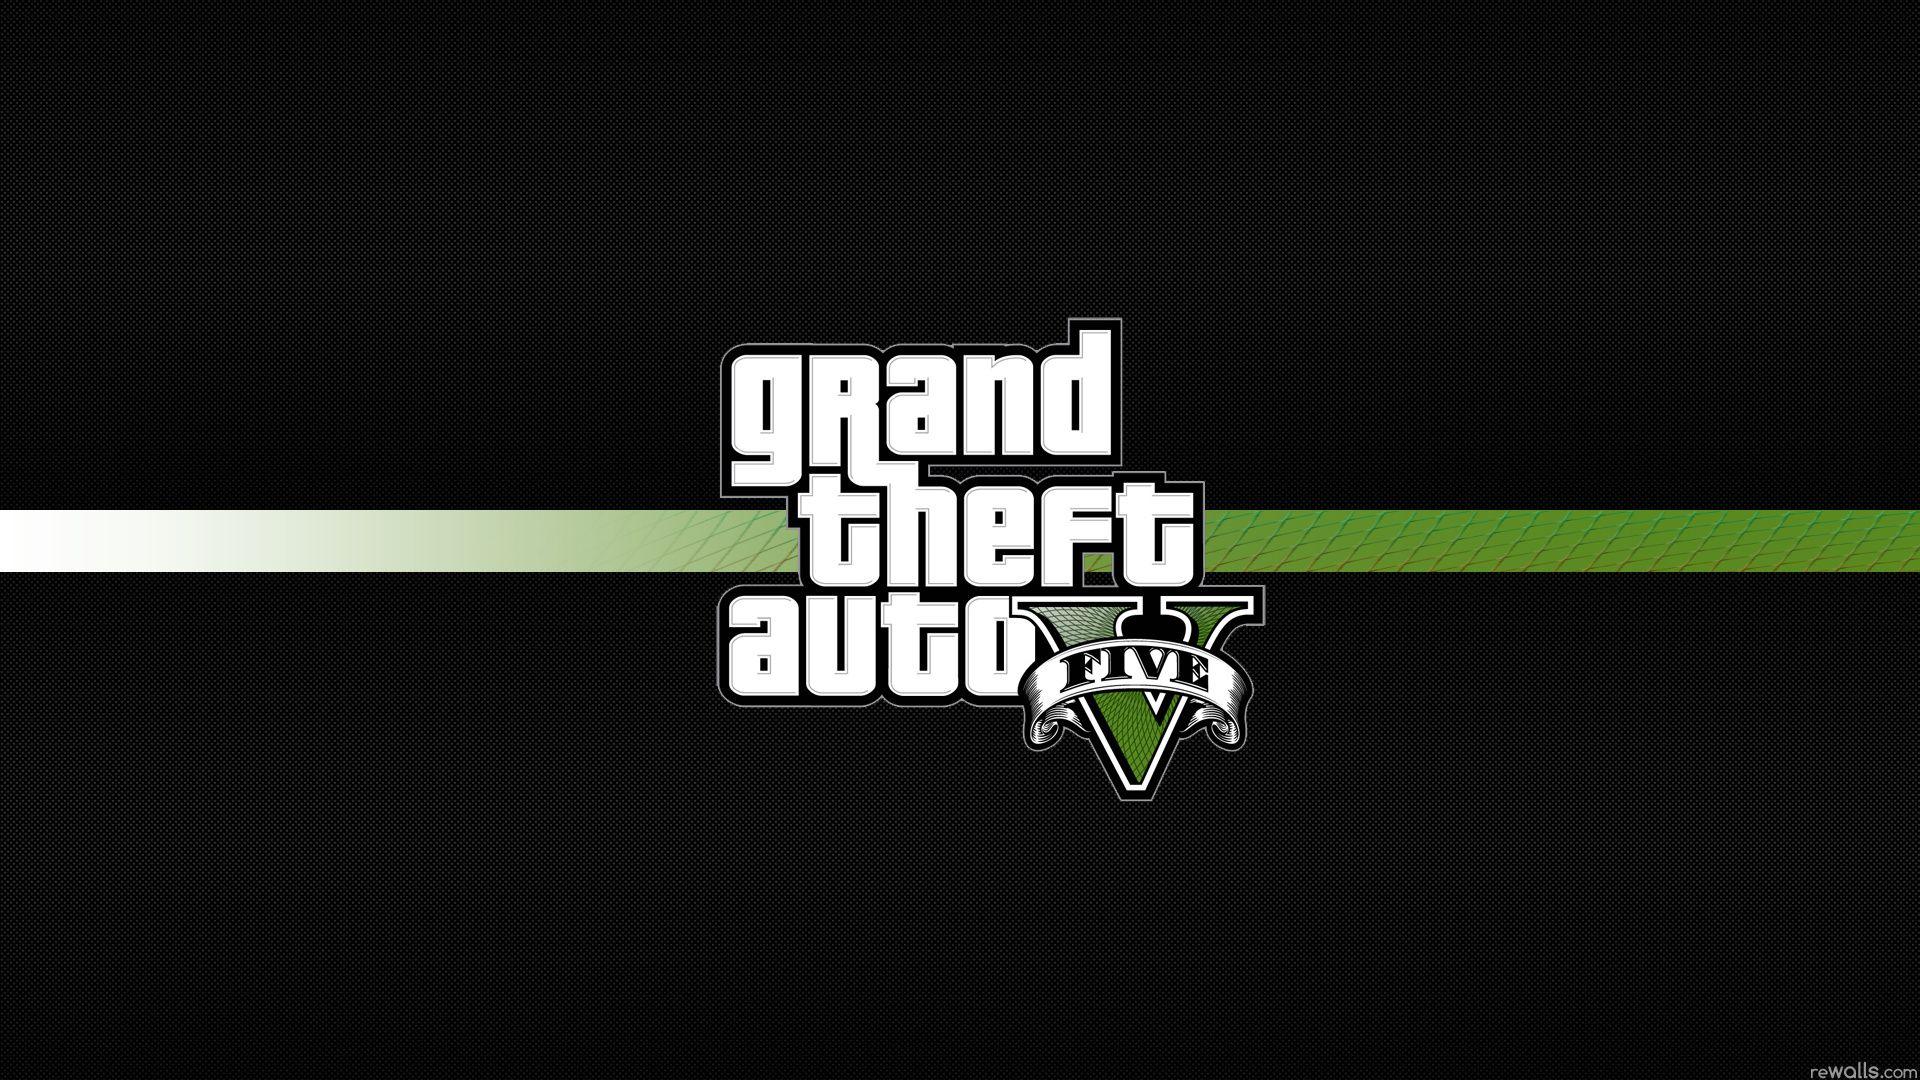 Grand Theft Auto Gta 5 Black Wallpaper Hd 1080p Wallpaper Grand Theft Auto Gta Gta 5